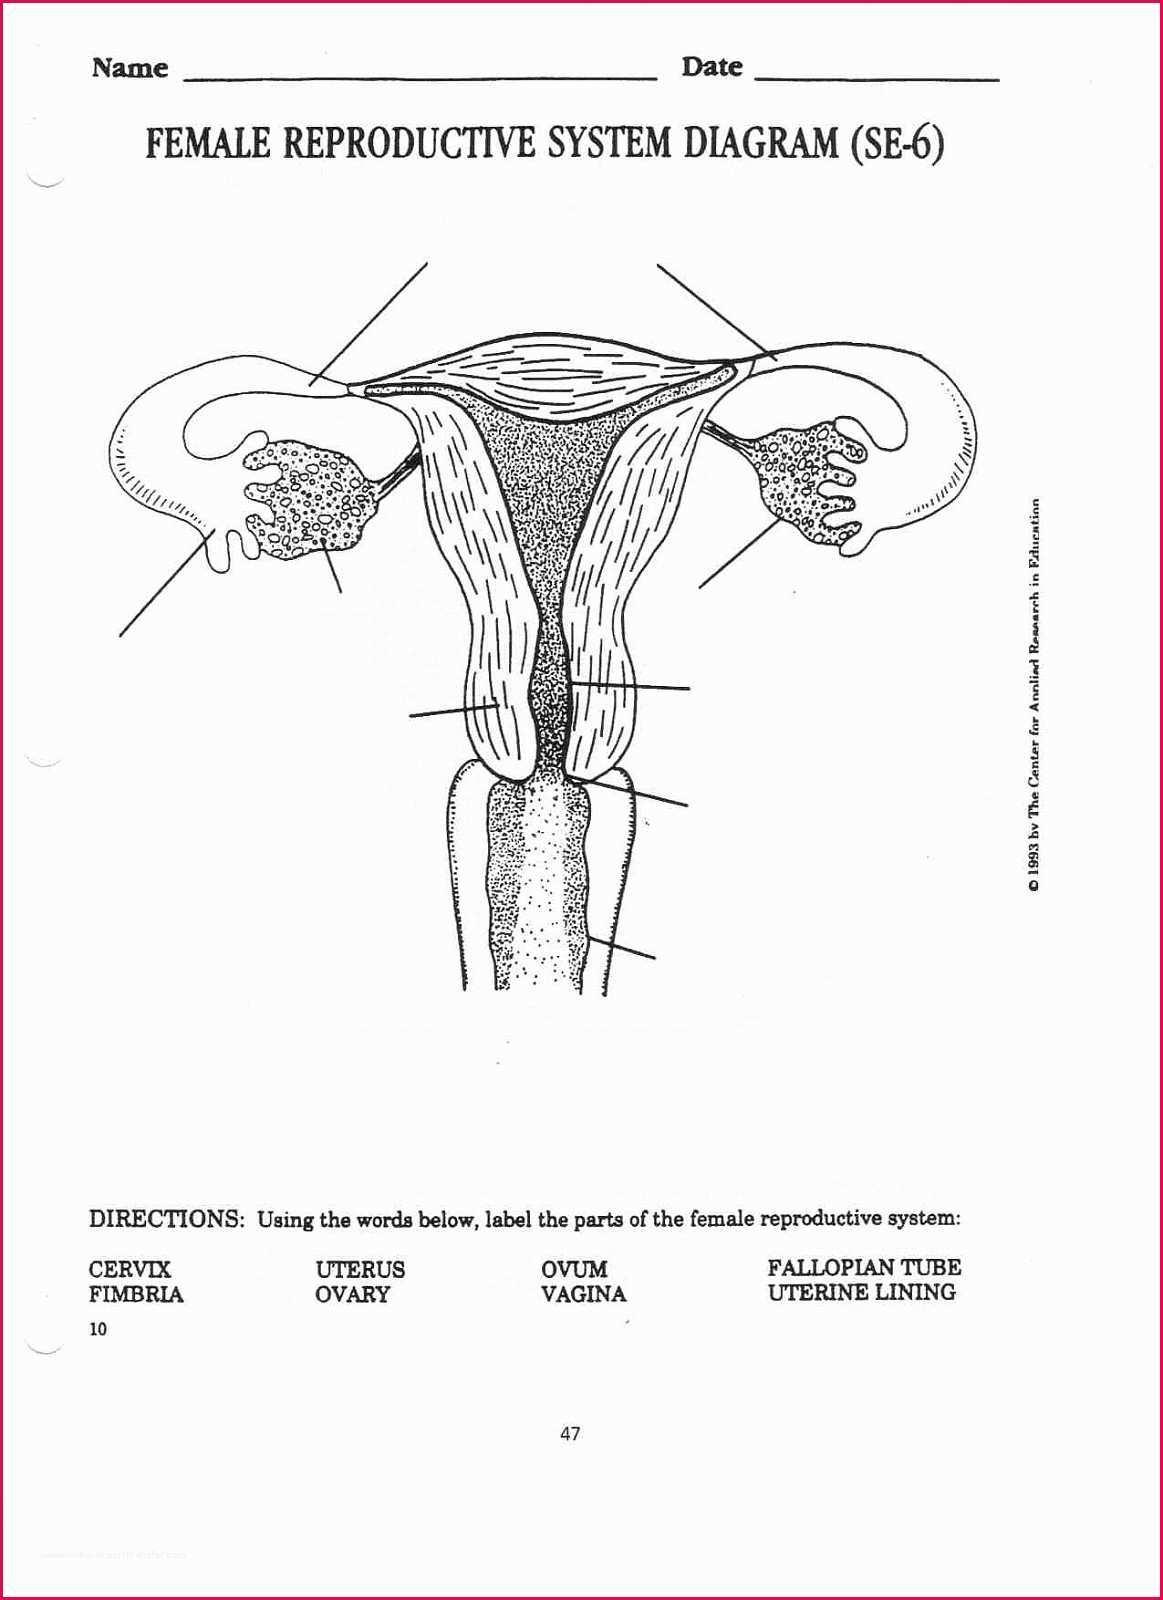 Female Reproductive System Diagram 37 Female Reproductive System Diagram Noibaiairporttransfer